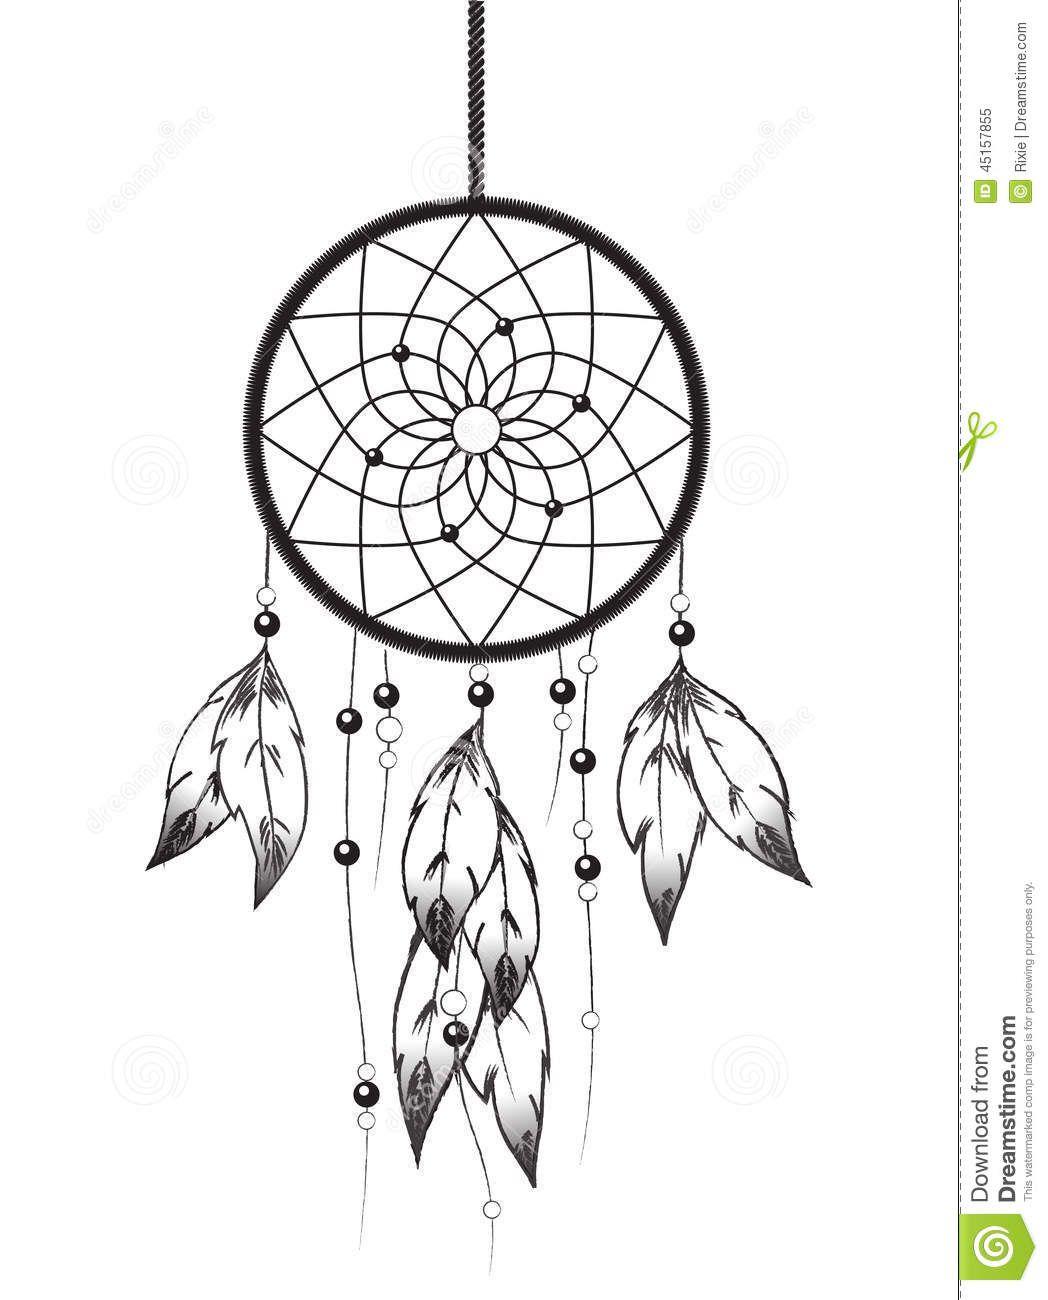 Afficher l 39 image d 39 origine dreamcatchers pinterest for Acchiappasogni disegno